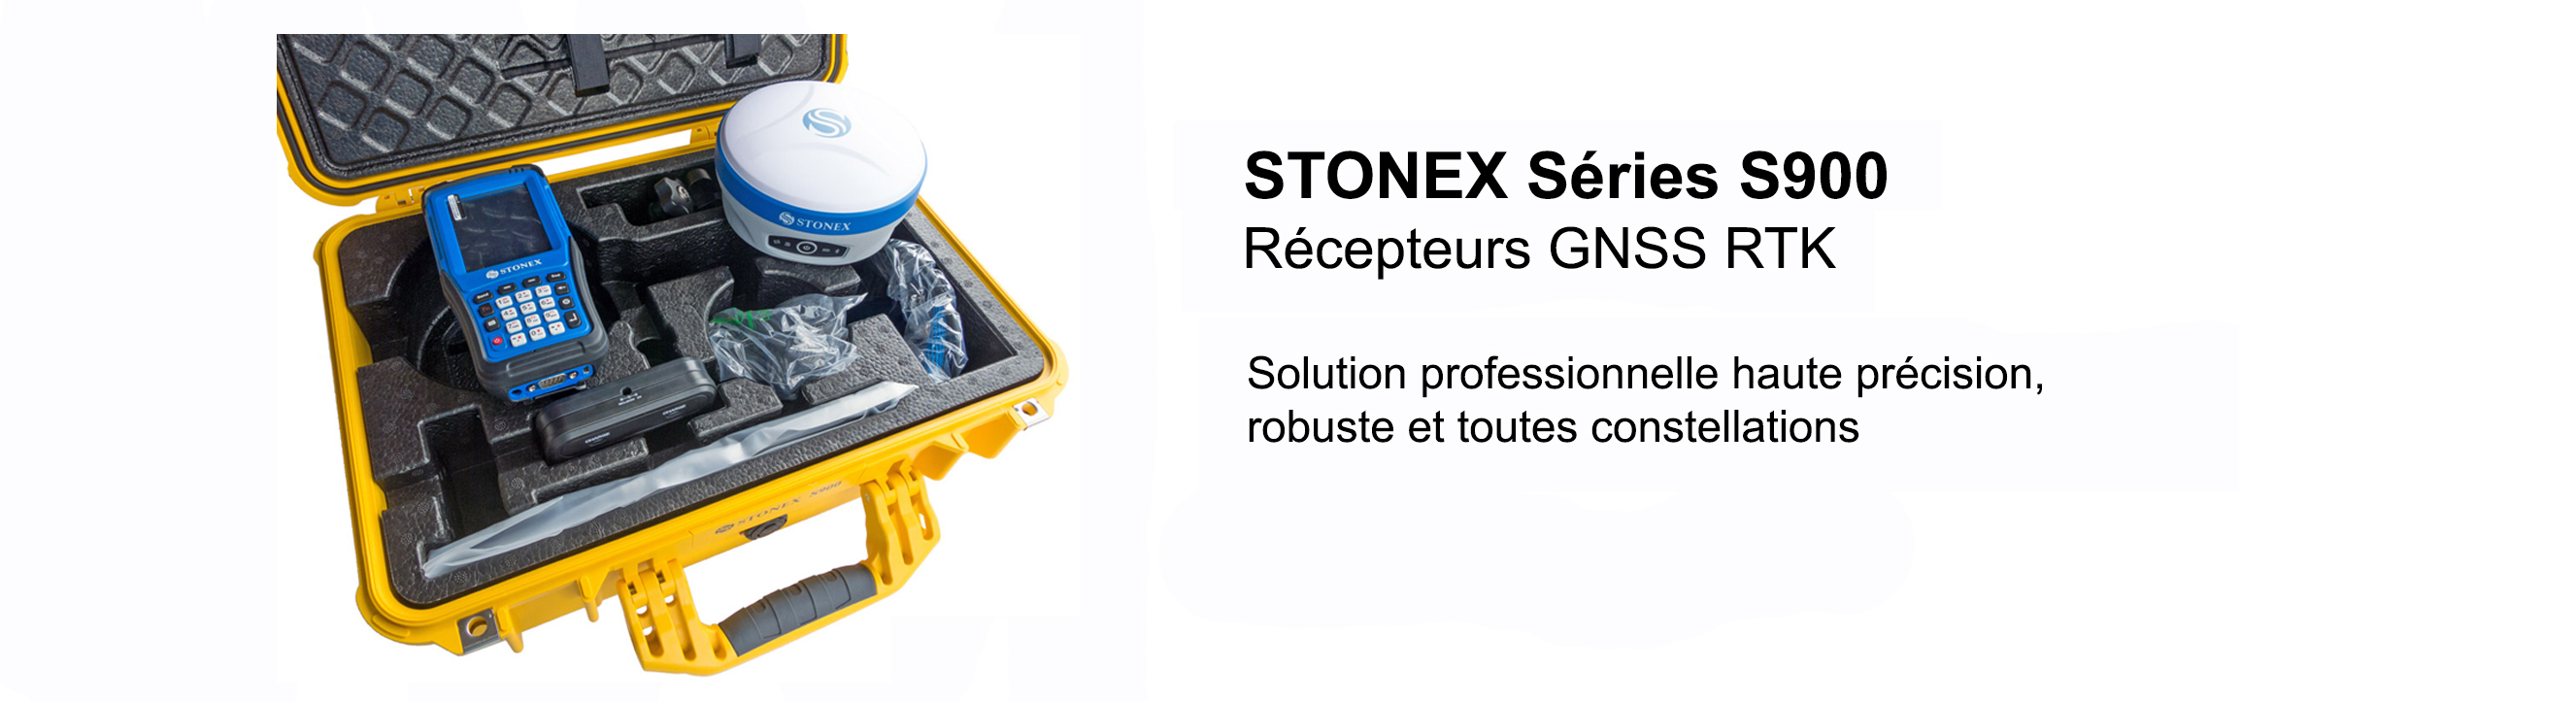 Stonex_S900_series_Drones_Imaging